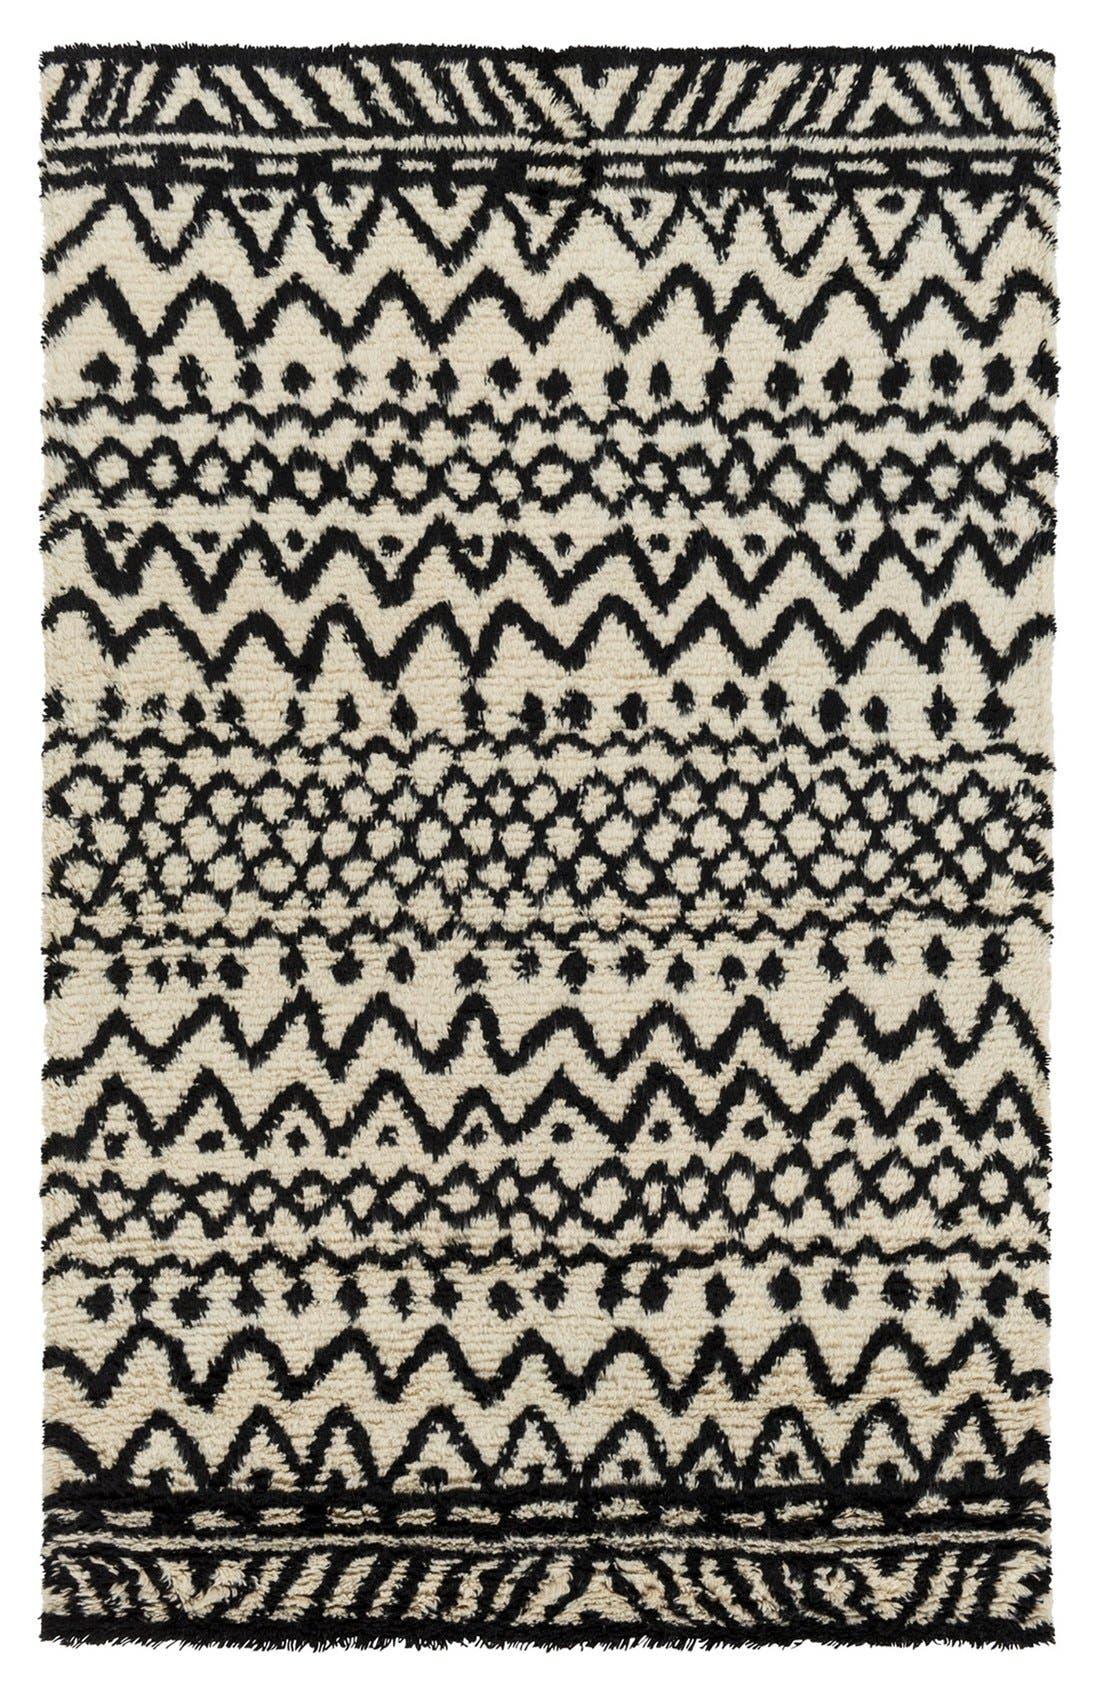 'Dwell C' Wool Rug,                             Main thumbnail 1, color,                             250